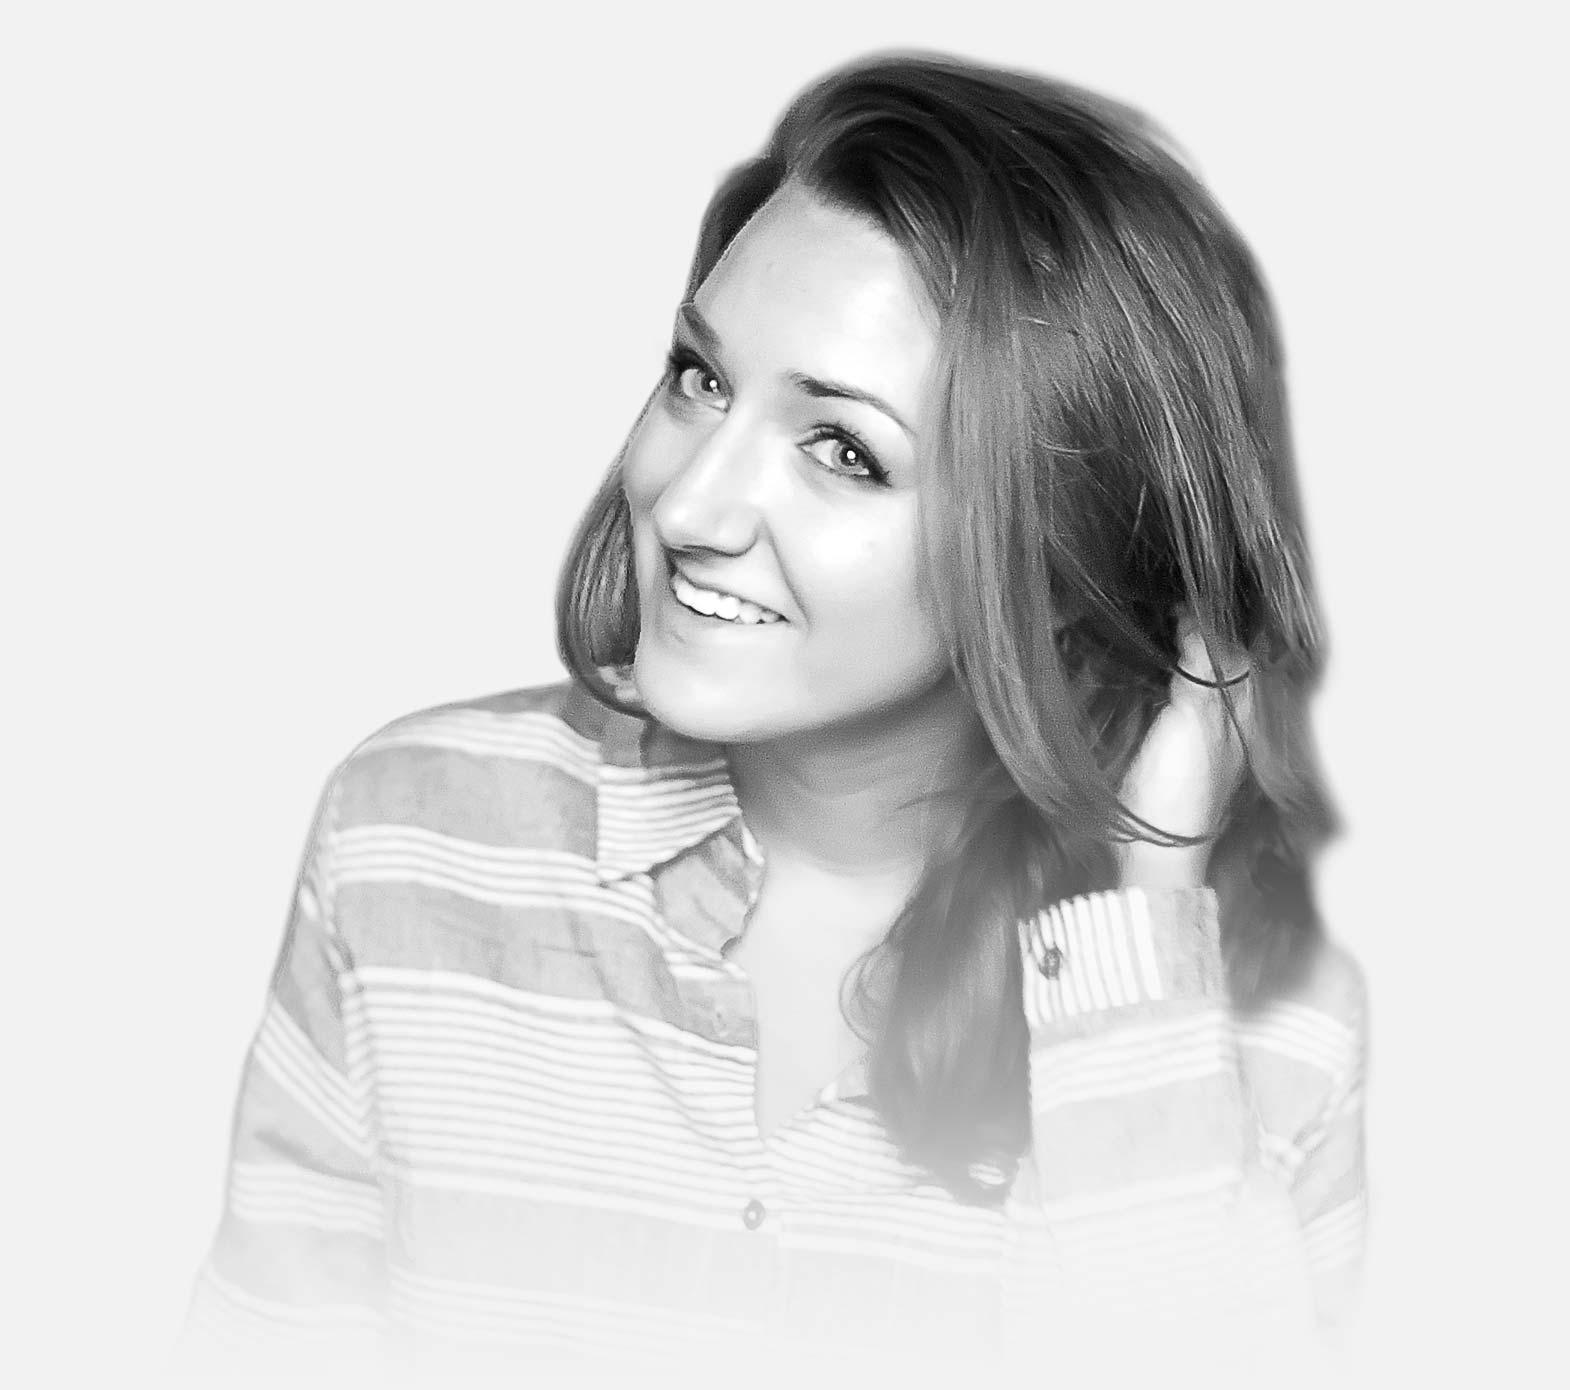 Portrait of Erin Gray